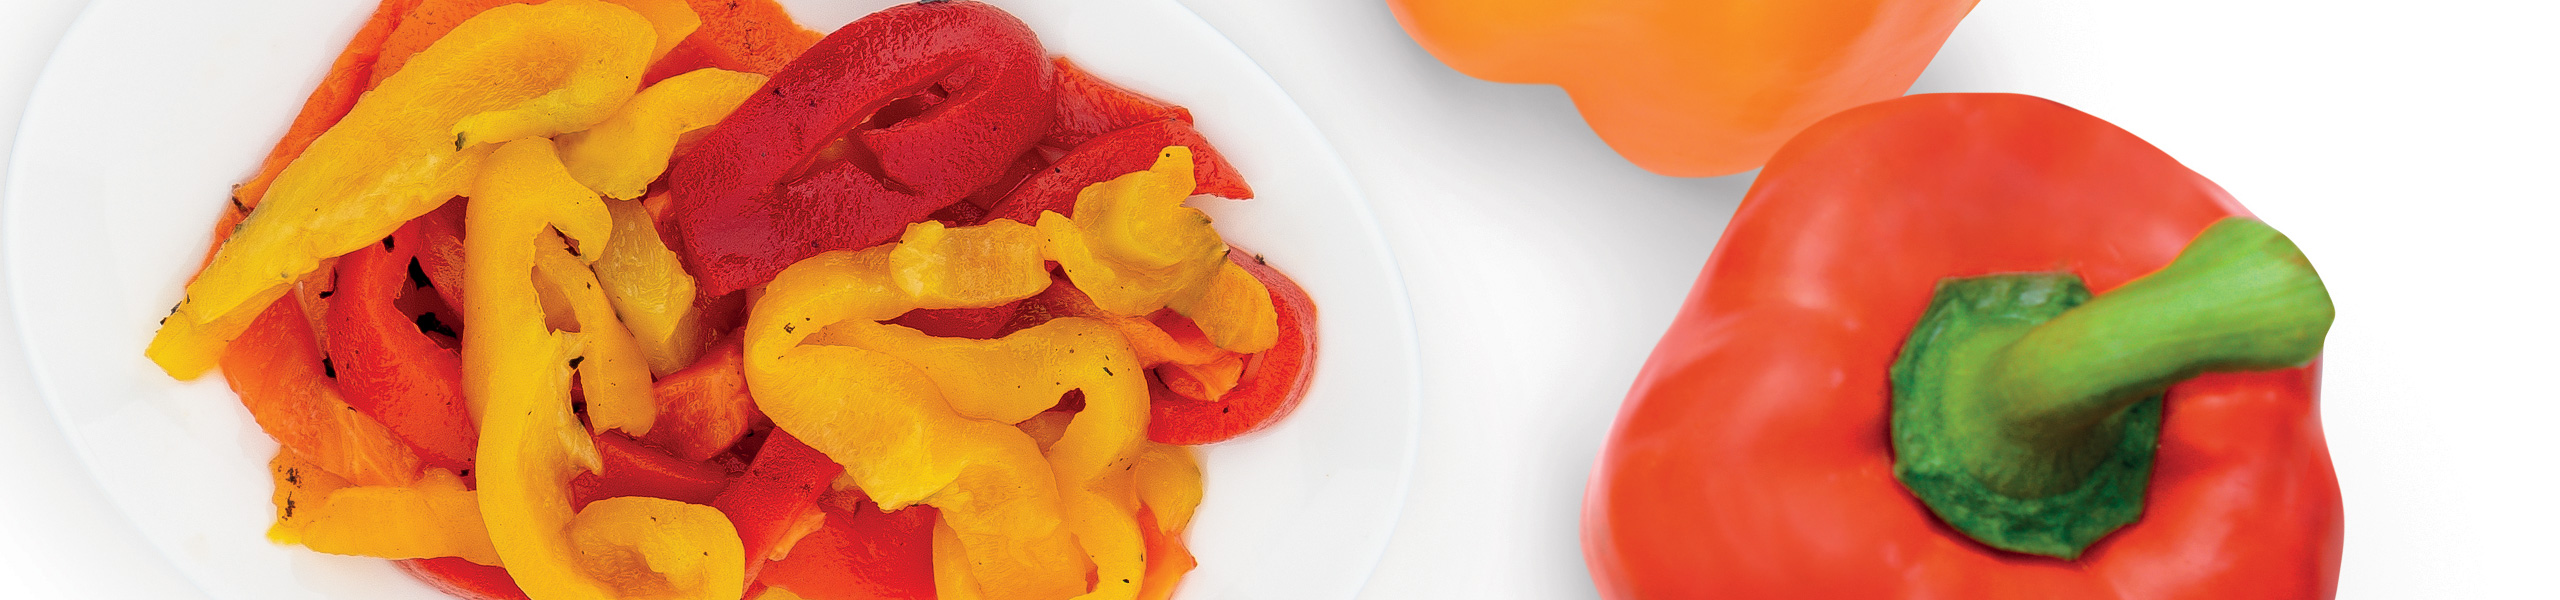 Peperoni Arrostiti a filettoni